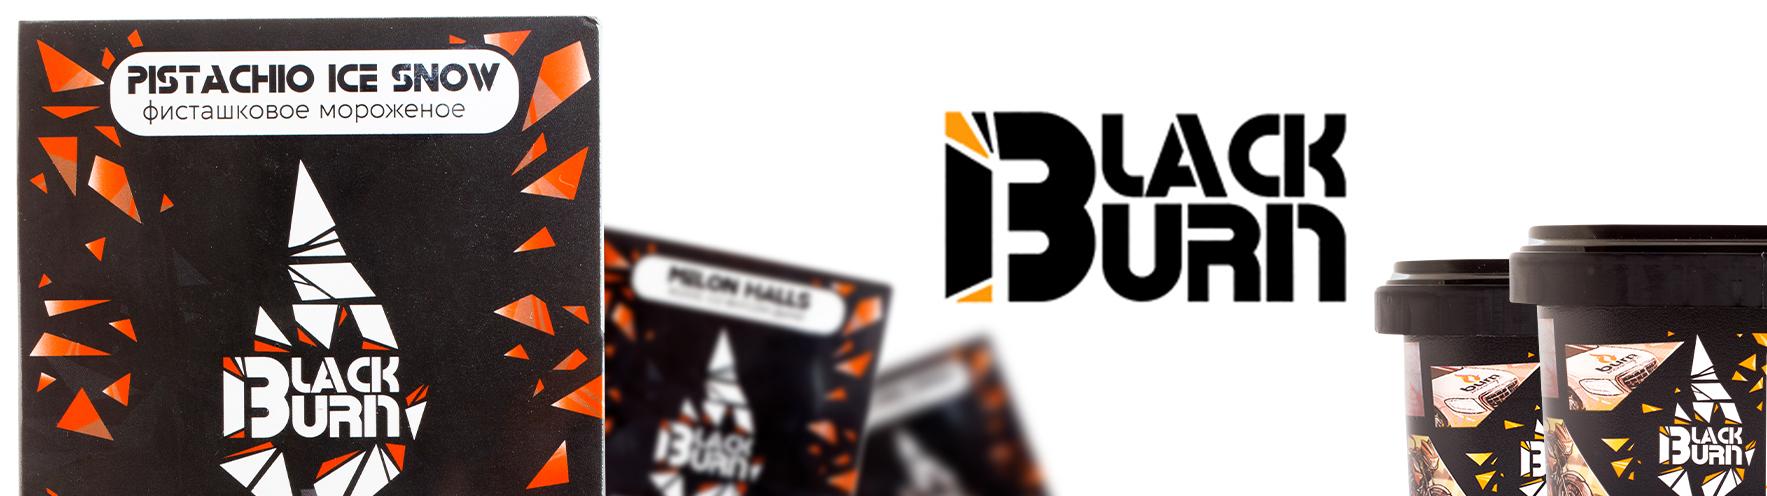 Табак для кальяна Burn Black на официальном сайте ilfumo